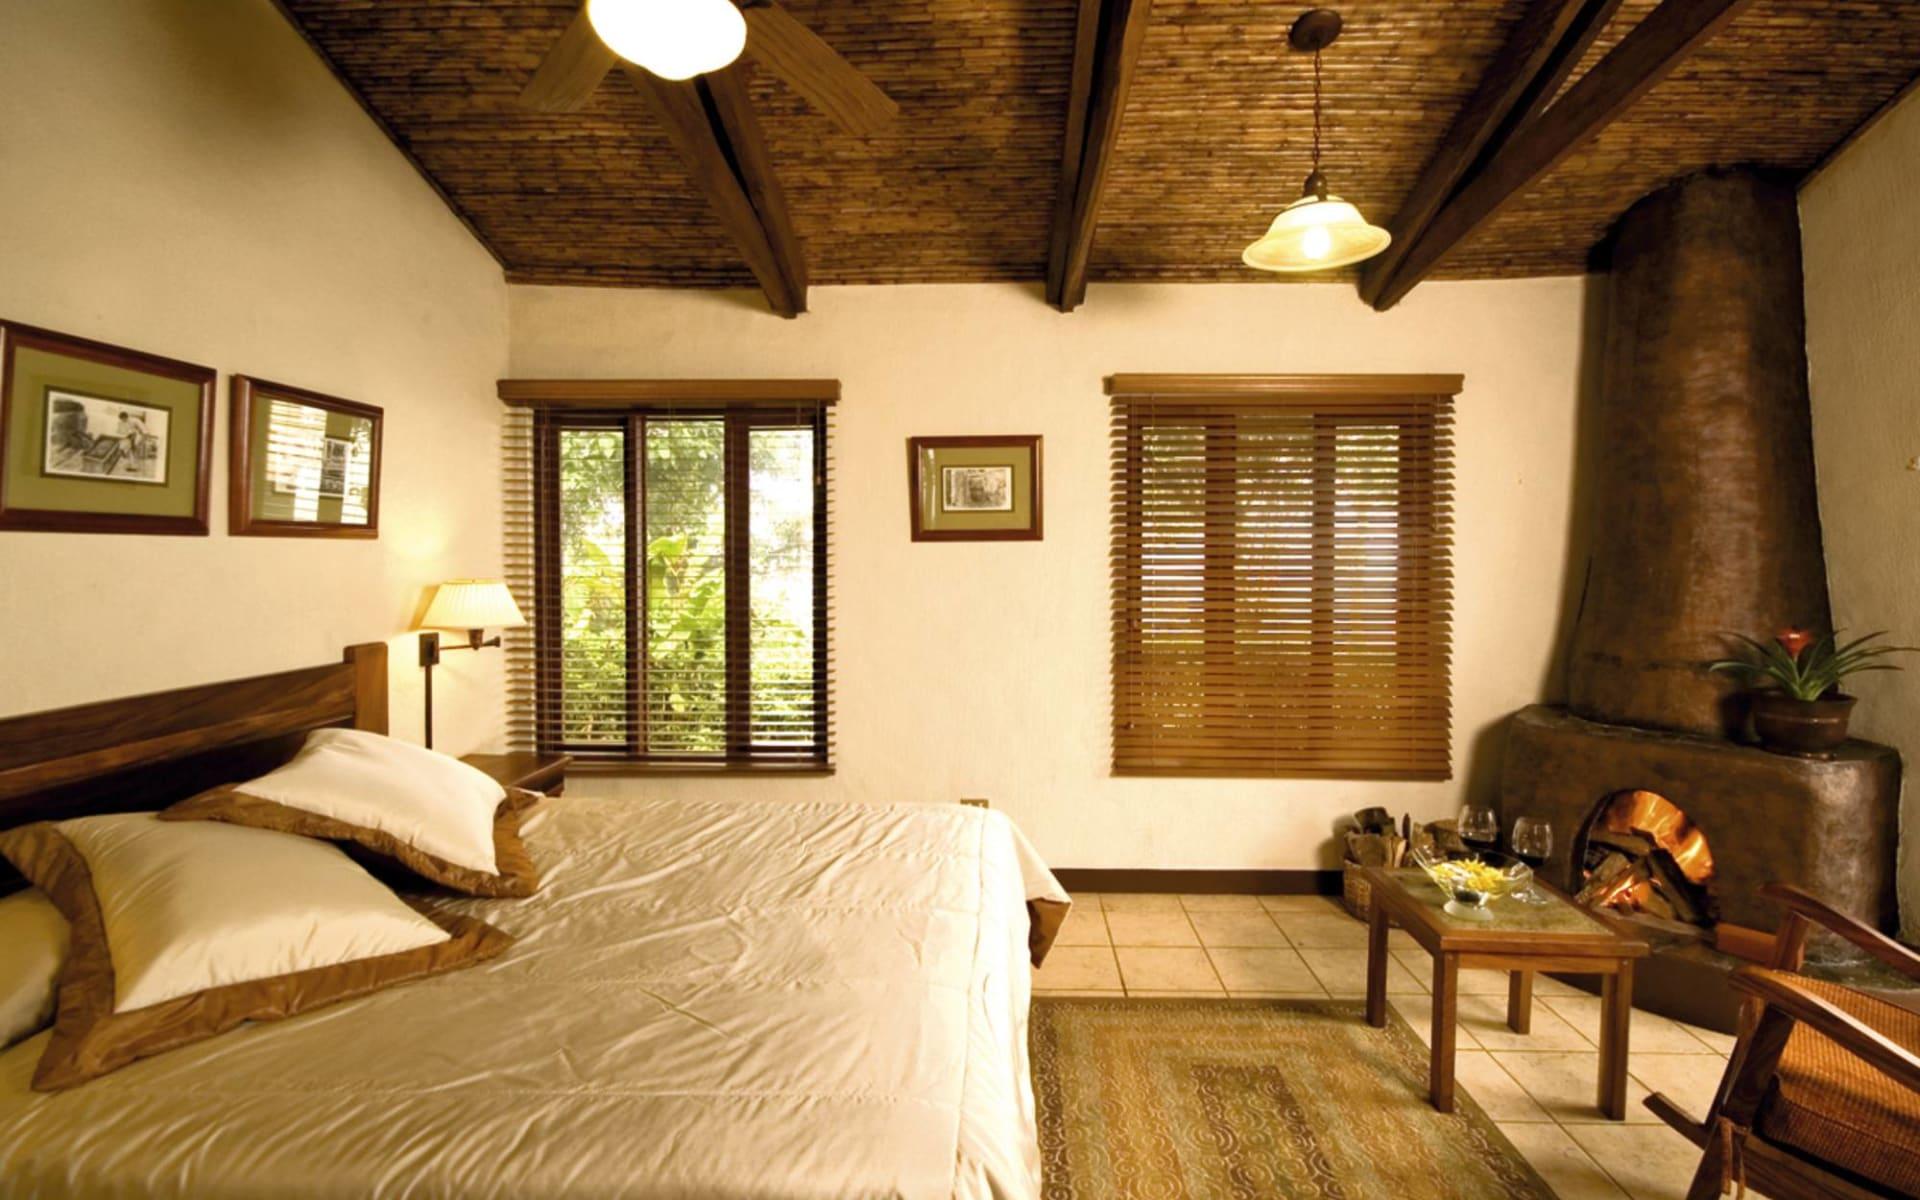 Villa Blanca Cloud Forest Hotel in San Ramon: zimmer villa blanca cloudforest hotel doppelzimmer